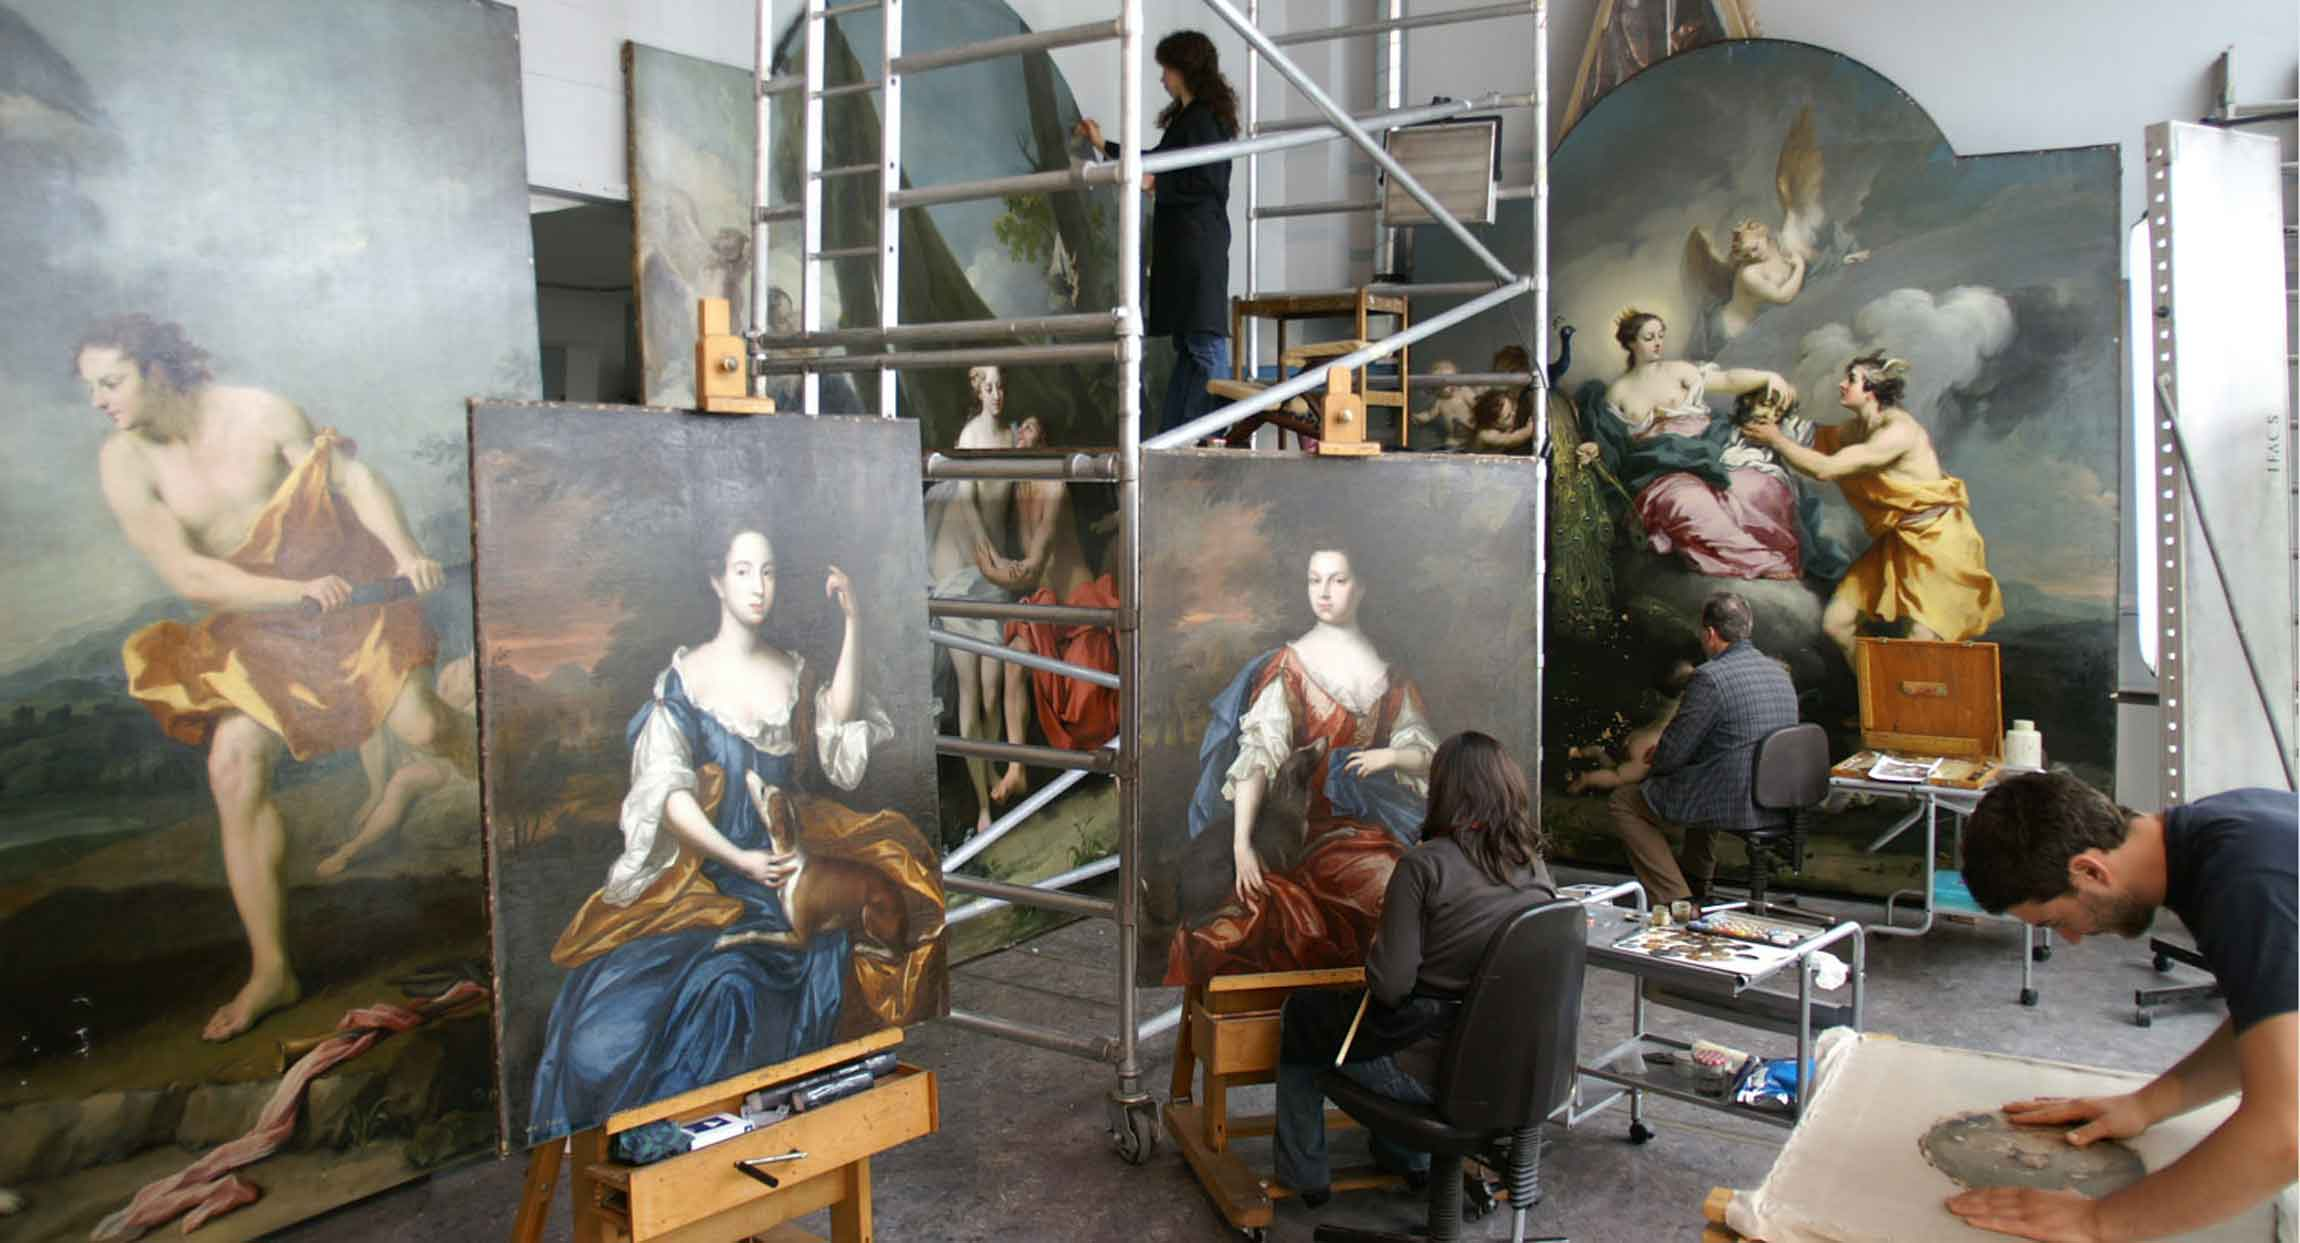 Ifacs Studio